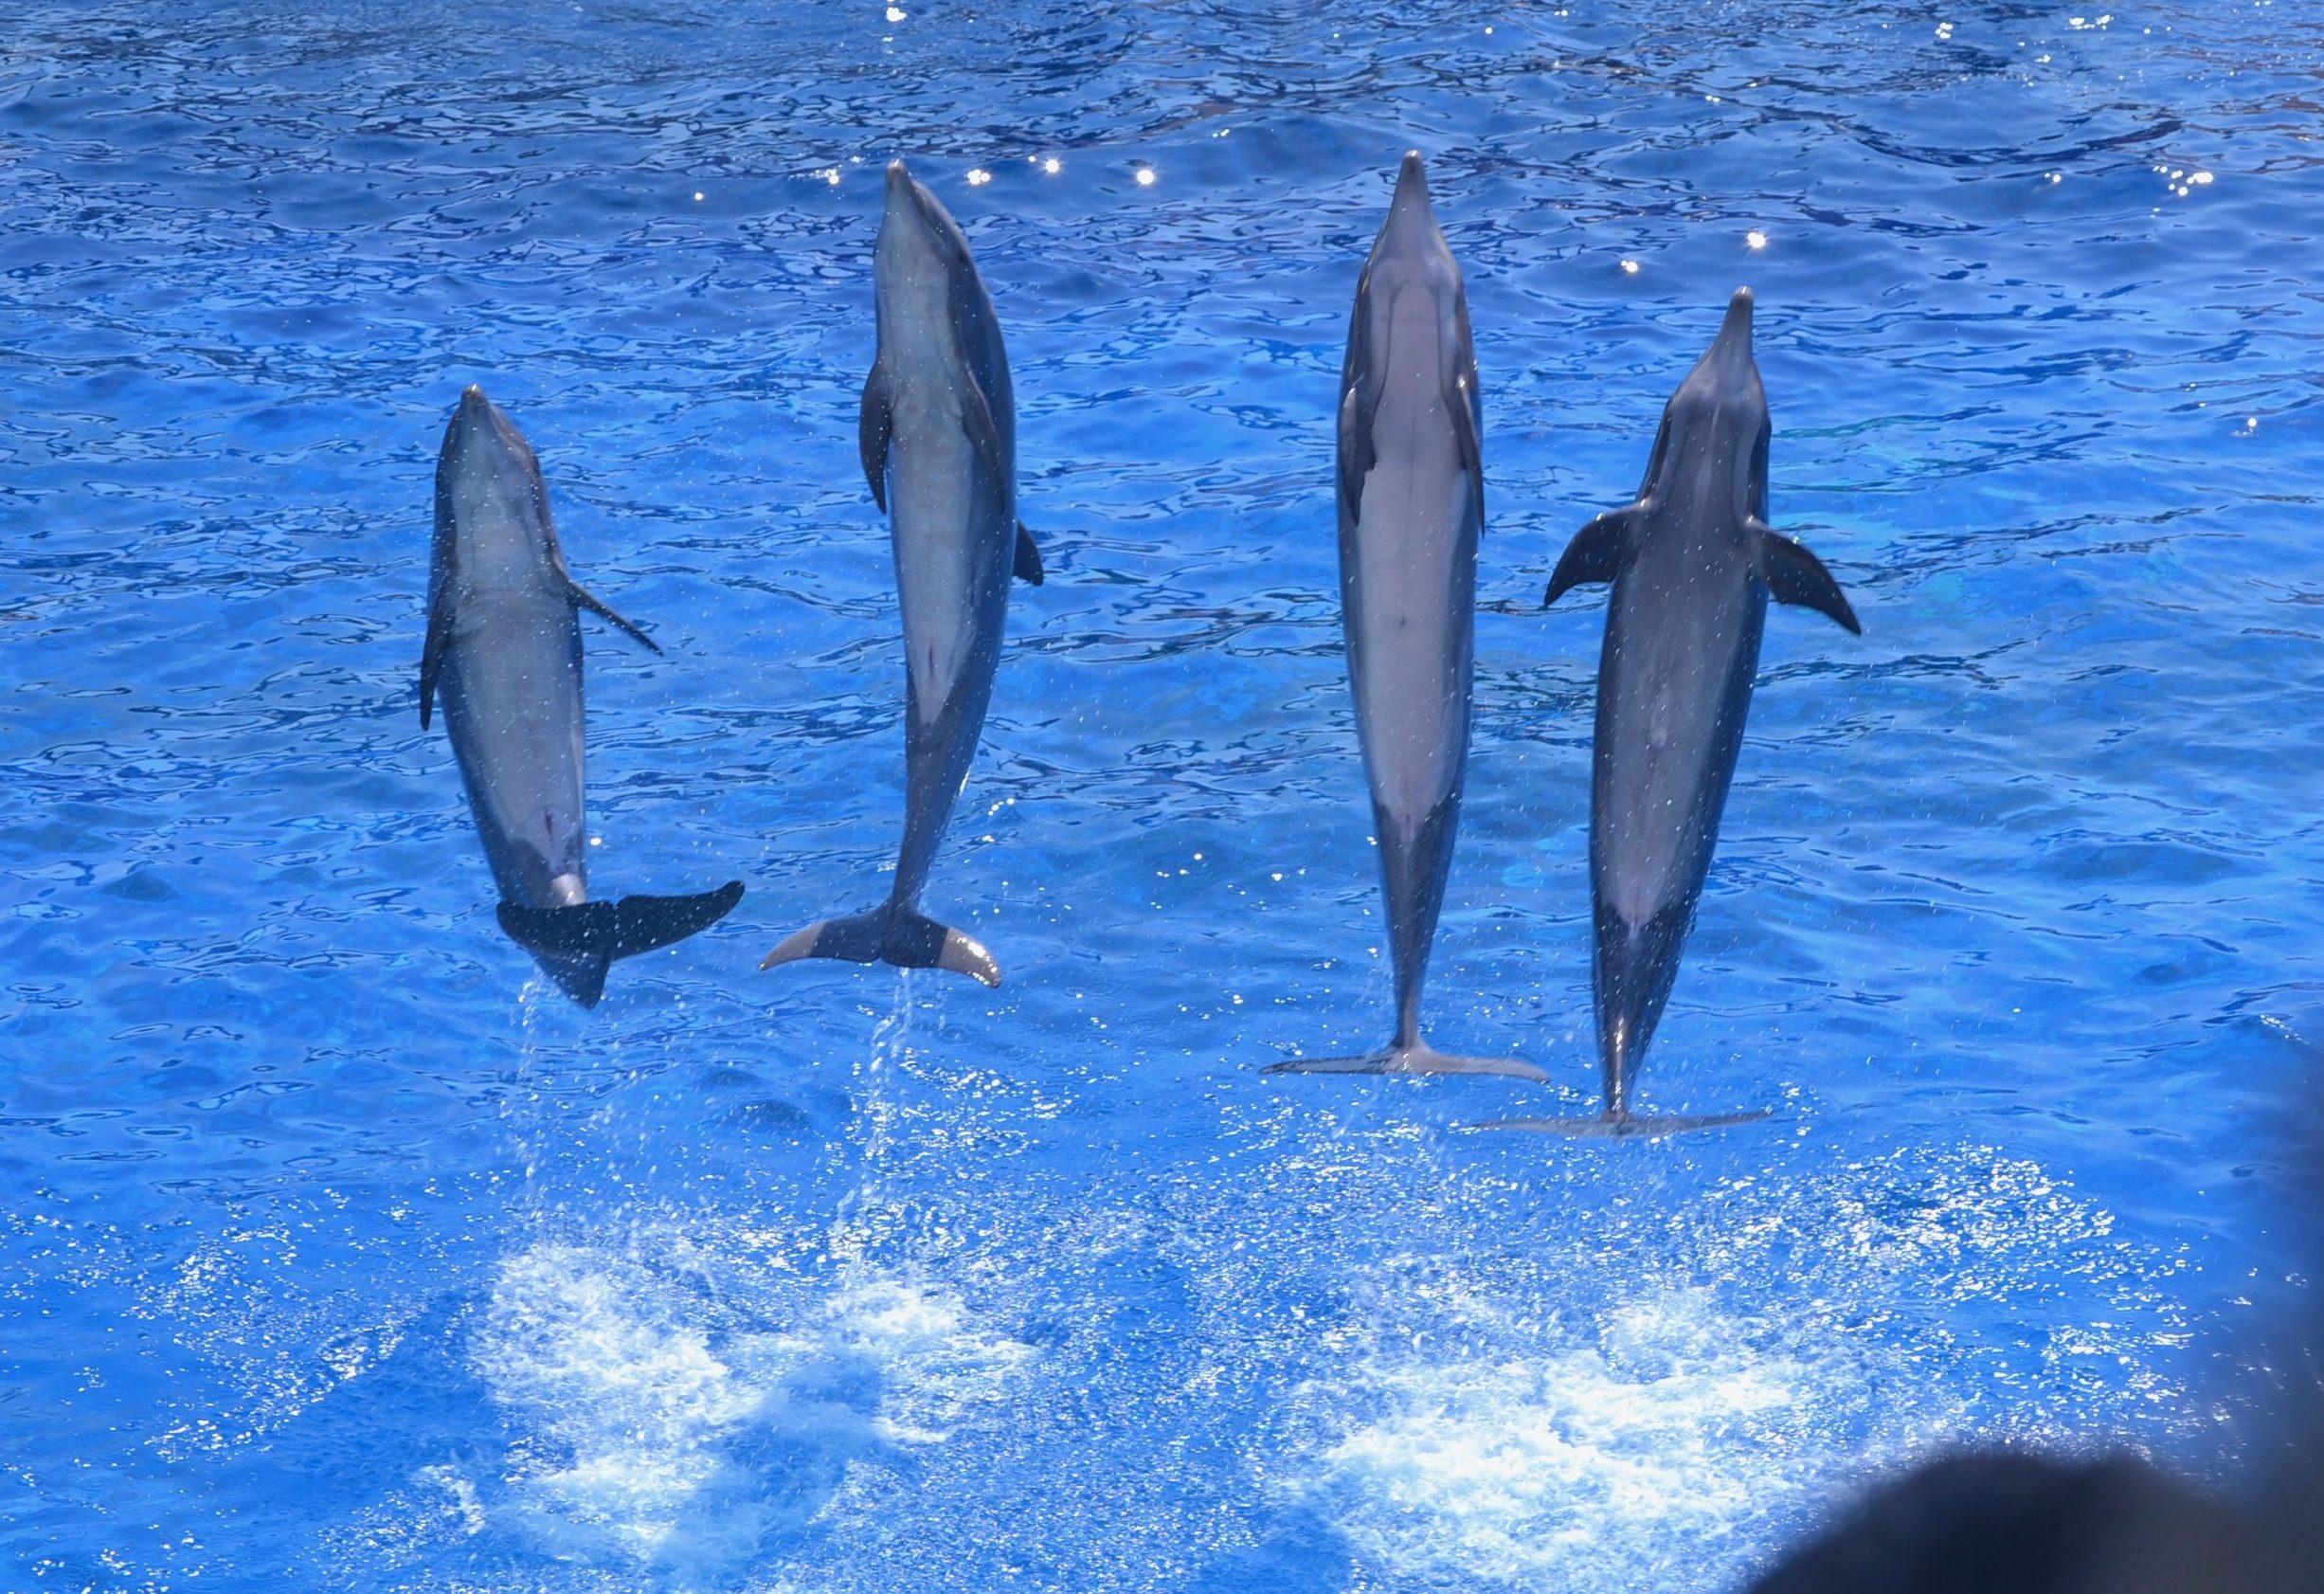 marineland-antibes-une-semaine-a-nice-blog-voyage-les-ptits-touristes-1